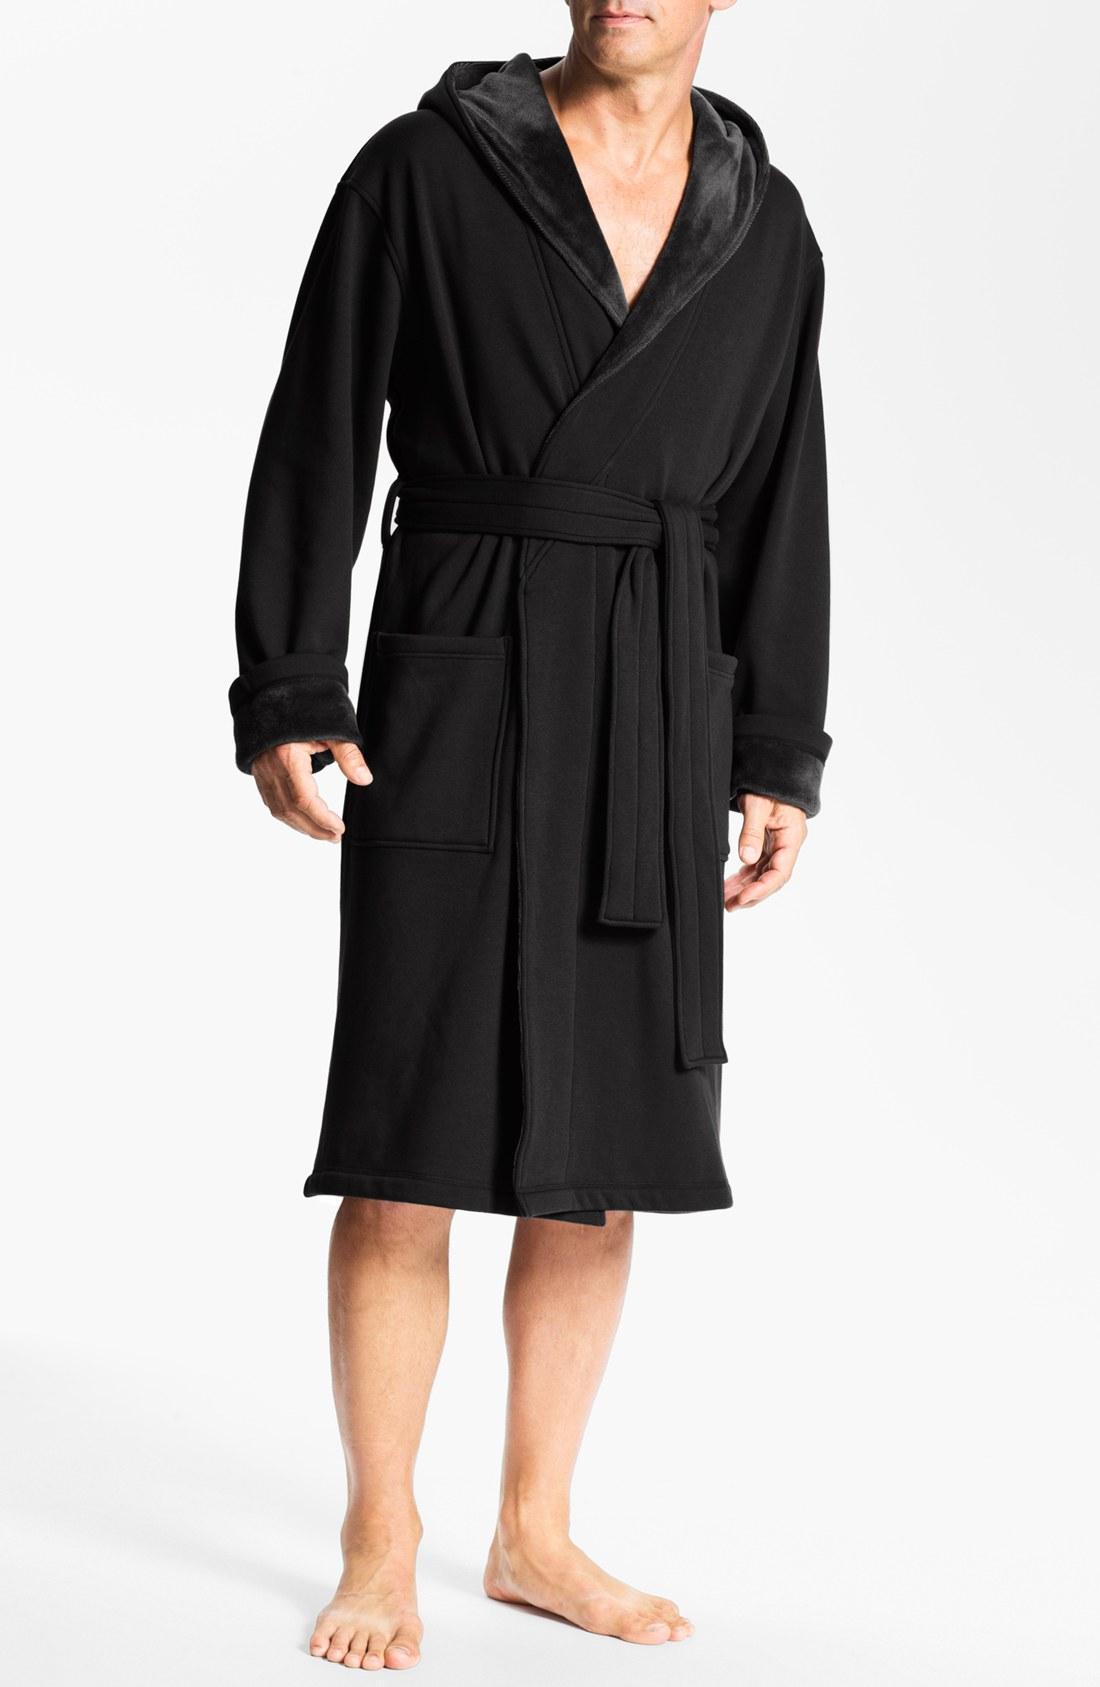 ugg mens bathrobe